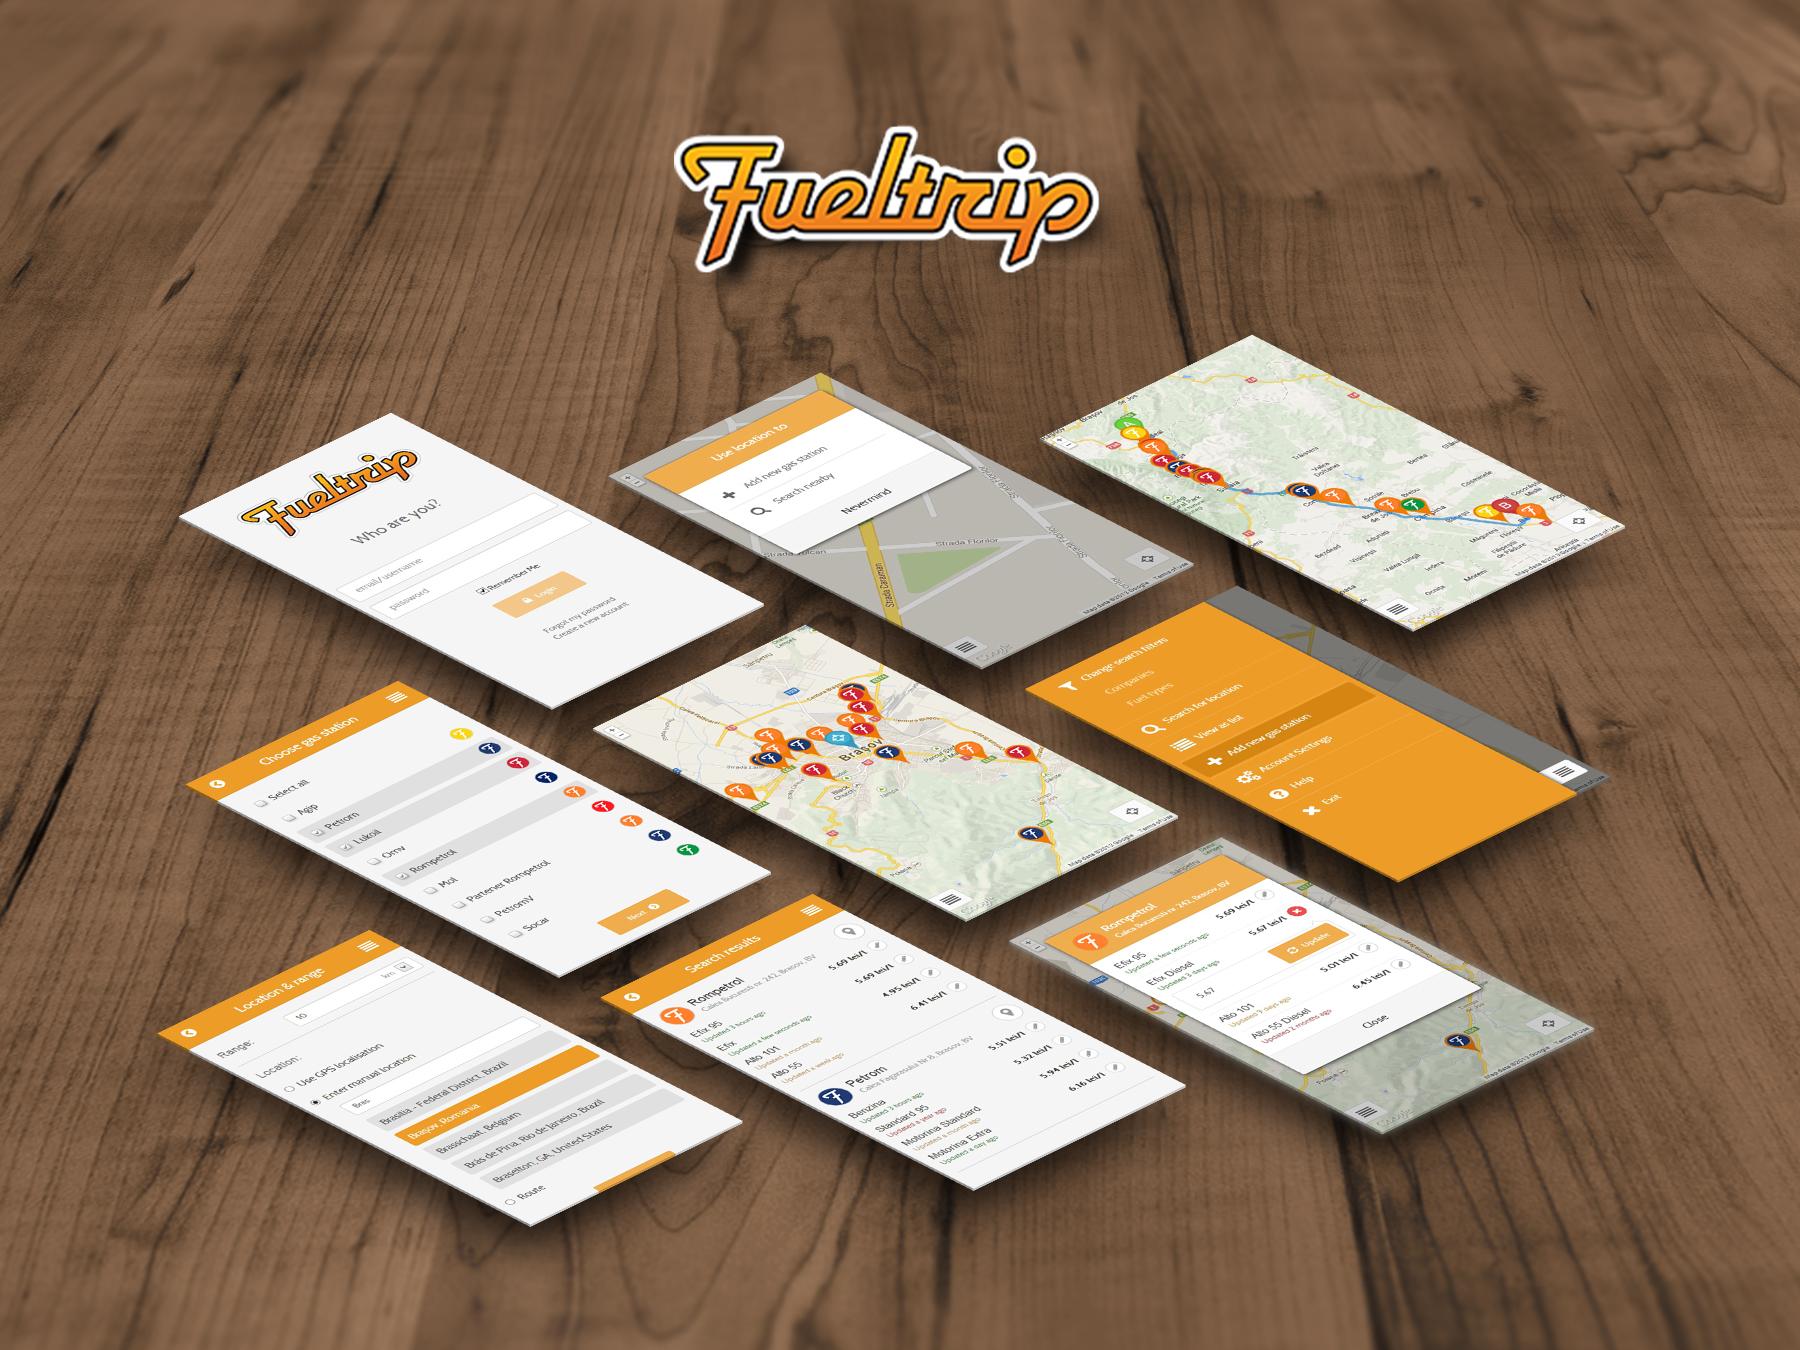 Fueltrip app